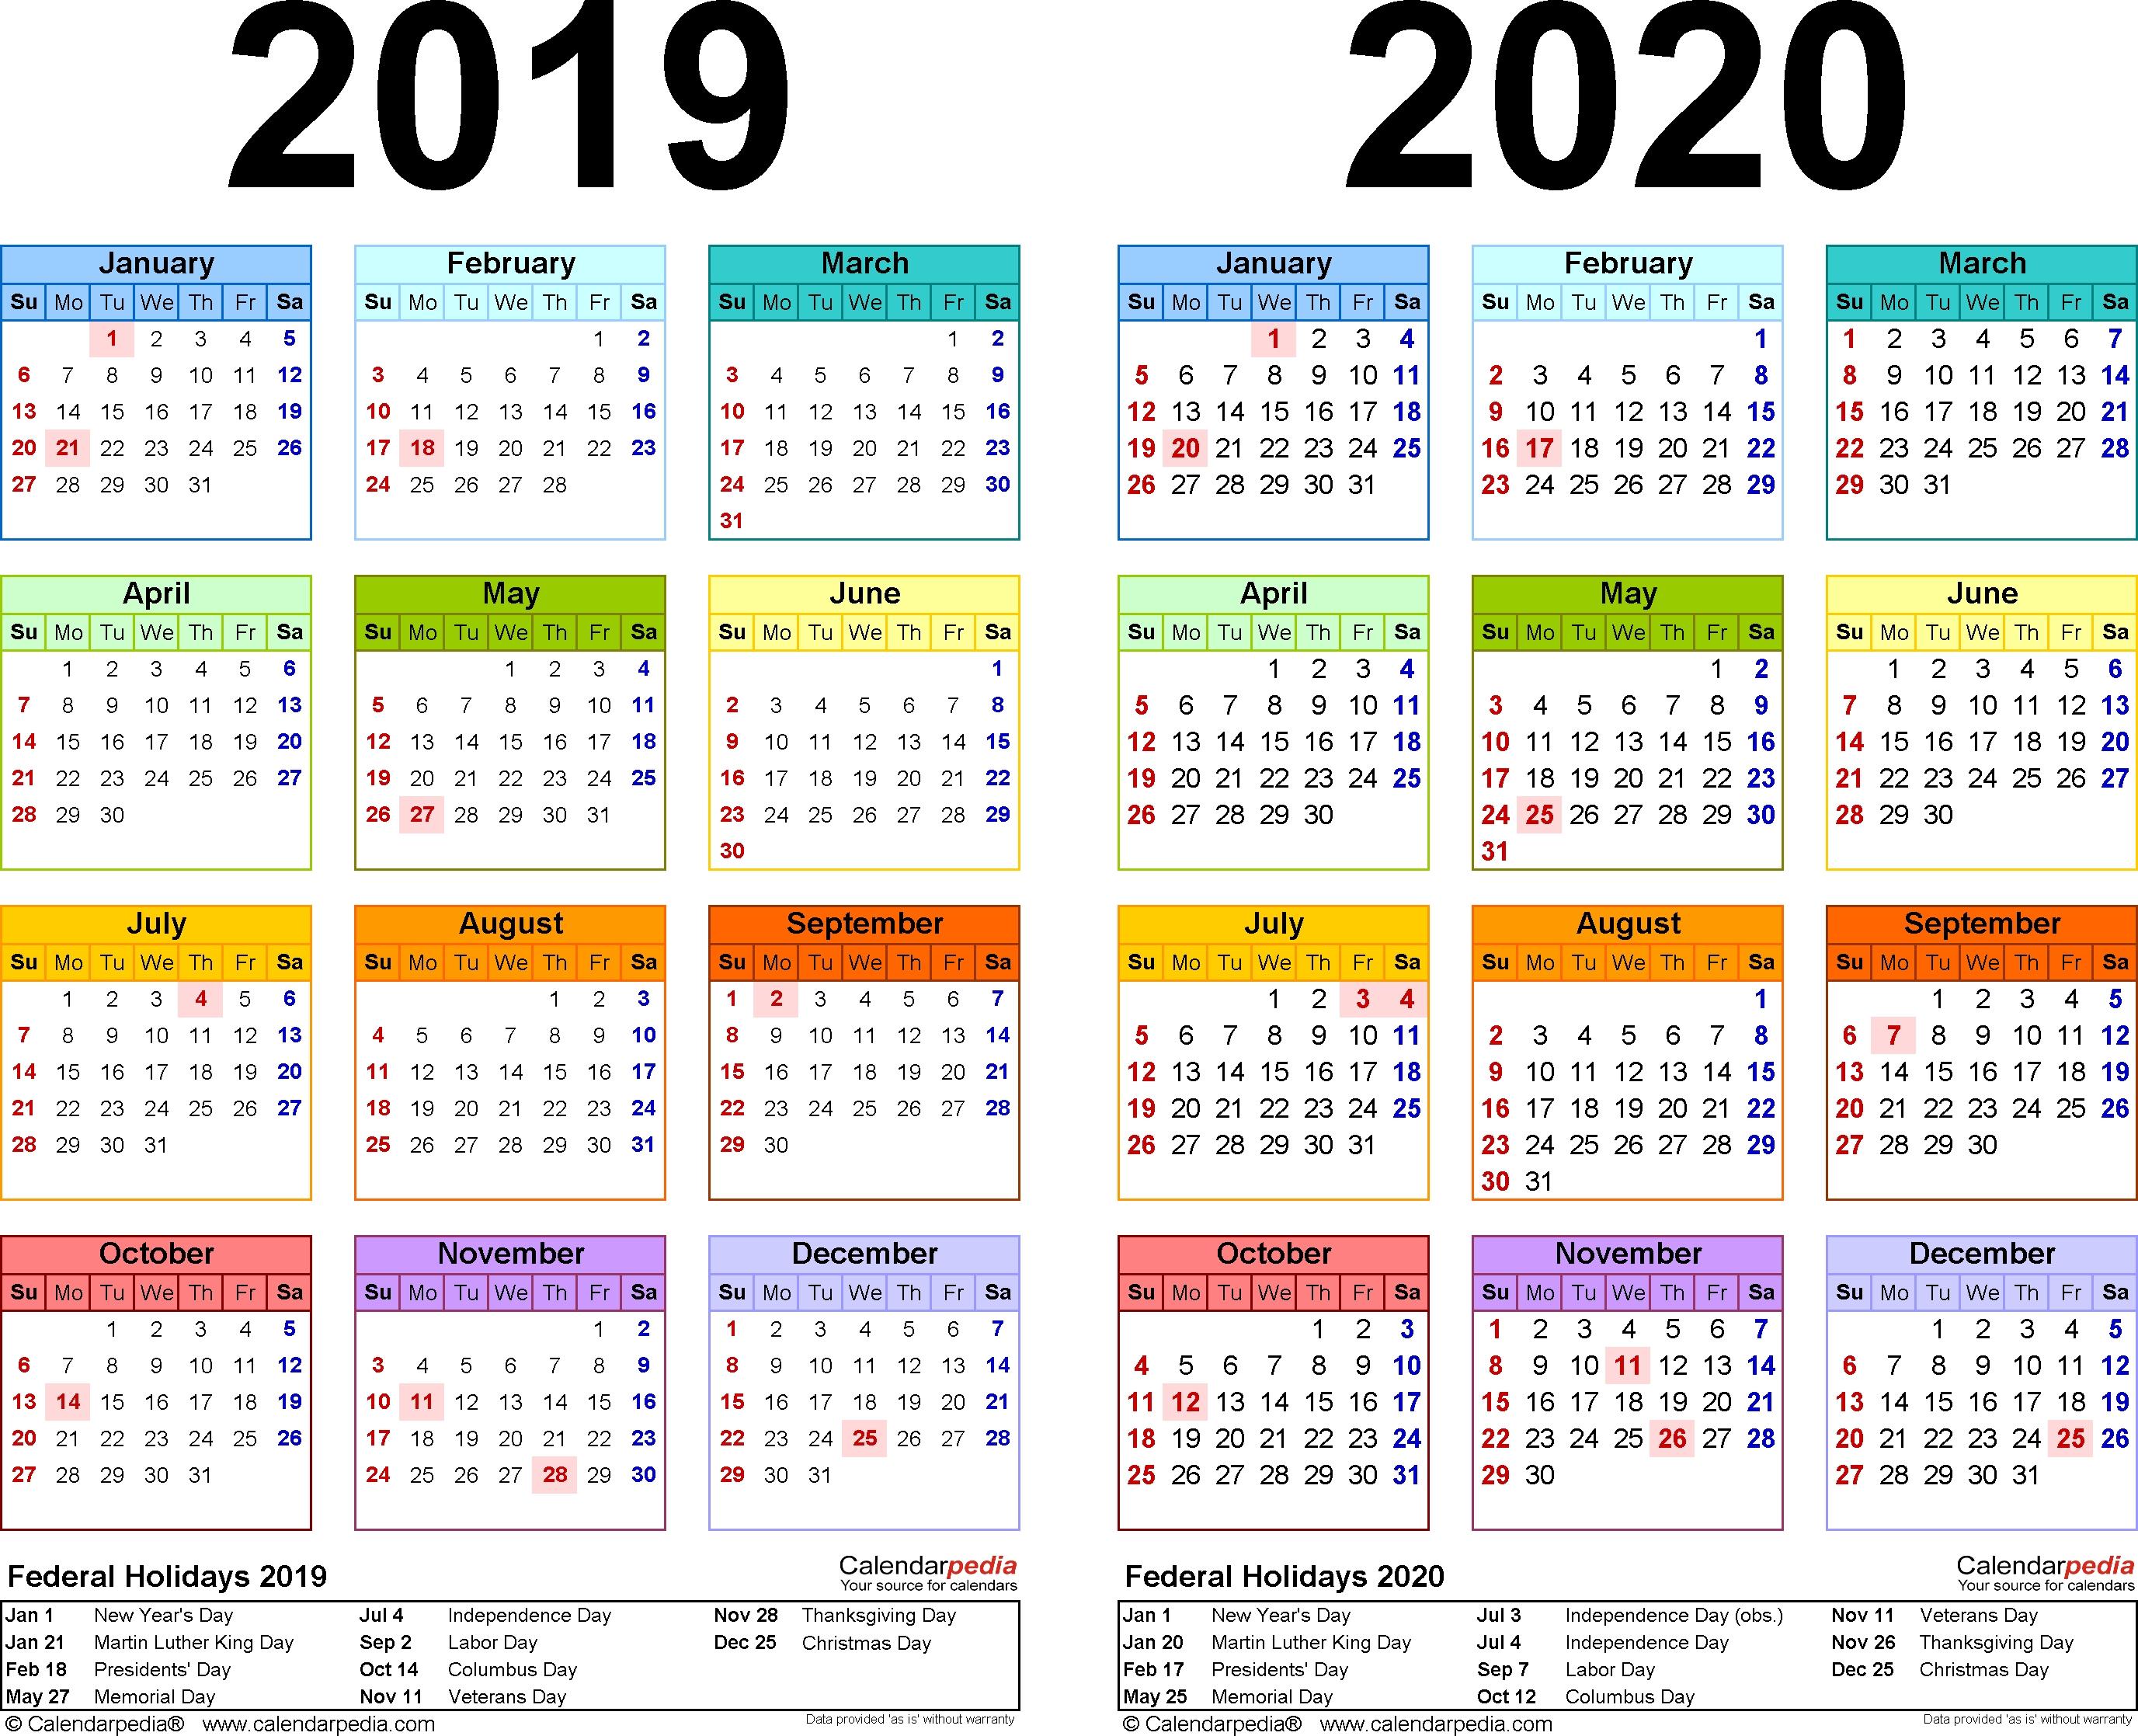 Printable Calendar For 2019 And 2020 | Printable Calendar 2019 regarding Free Half Page Calendars 2019-2020